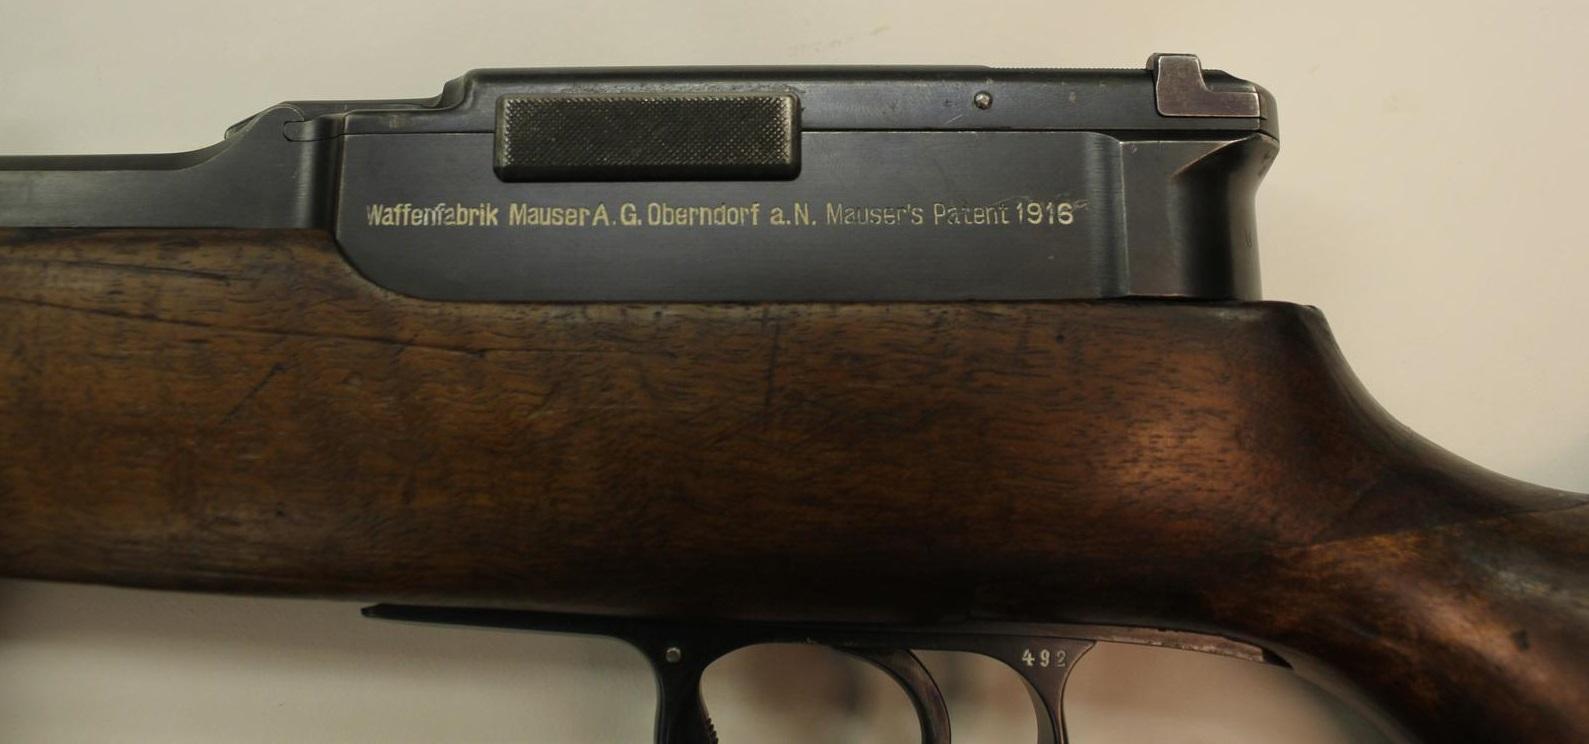 Mauser Selbstlader – Forgotten Weapons